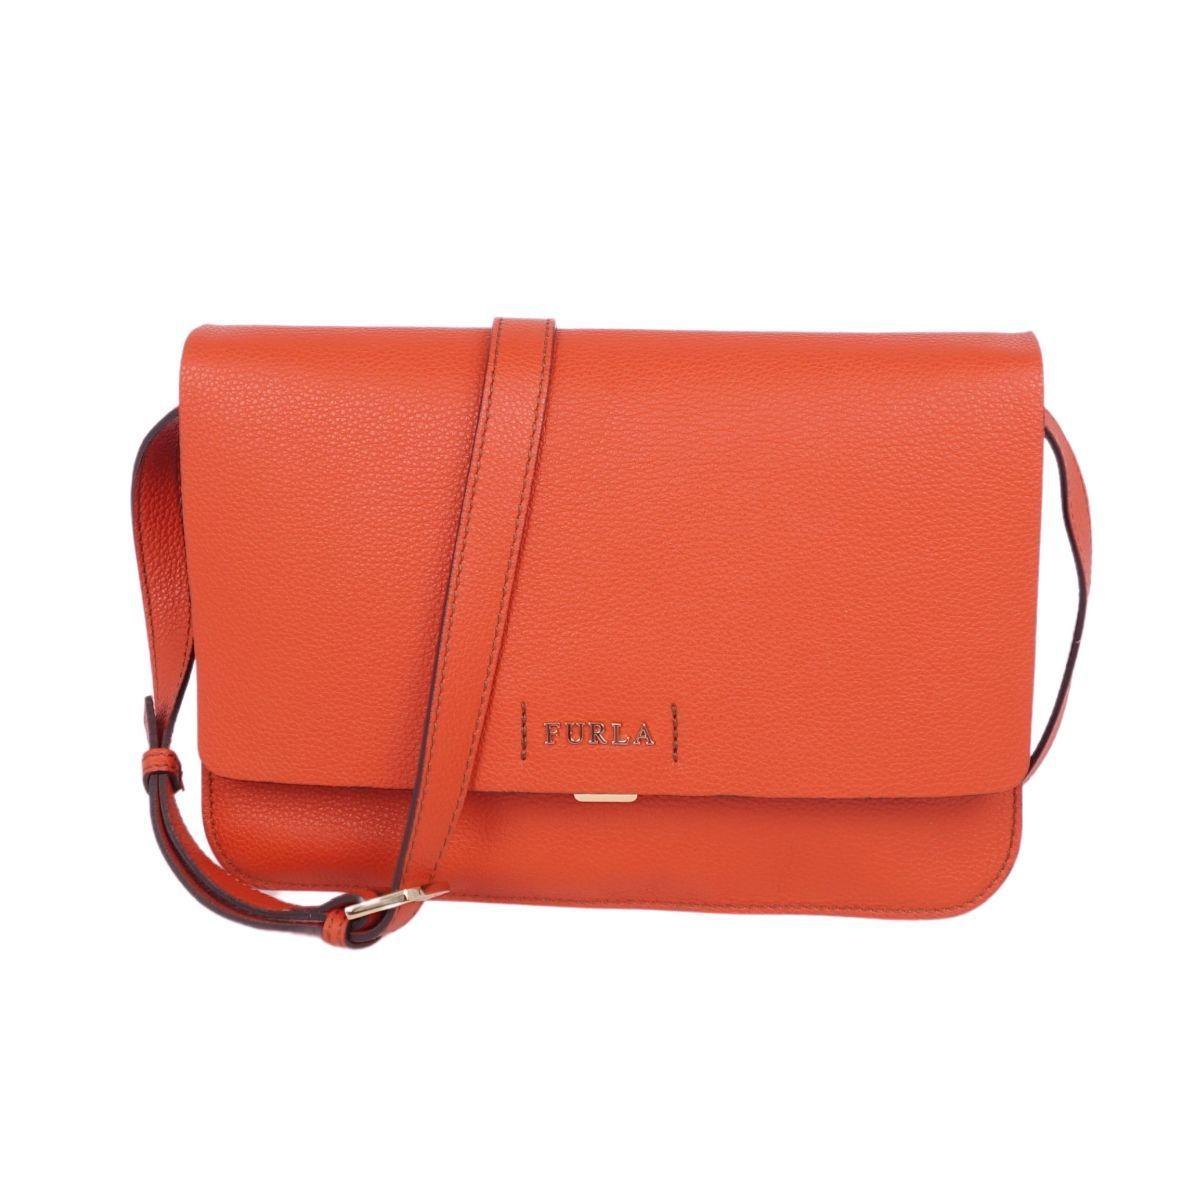 Furla FURLA Shoulder Crossbody Leather Women's Genuine Cowhide Orange